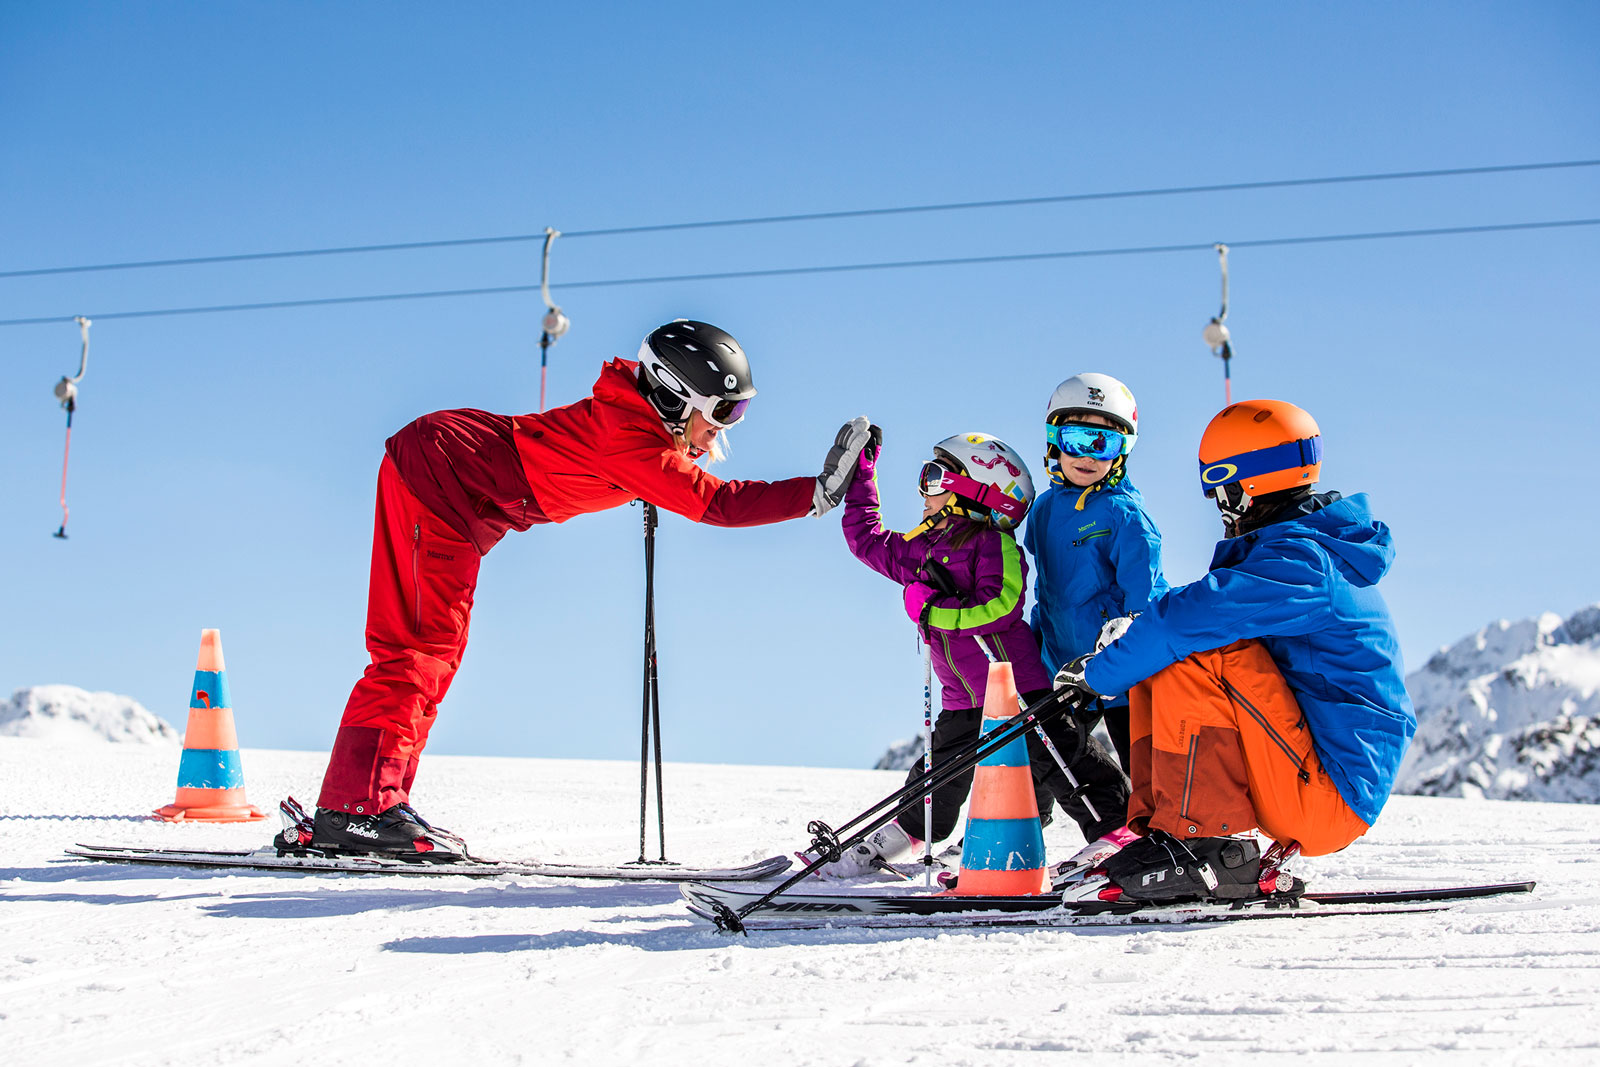 BIG-Family-Skiurlaub-mit-der-Familie-im-Stubaital---4-Hotel-Happy-Stubai-in-Neustift-Tirol-Austria